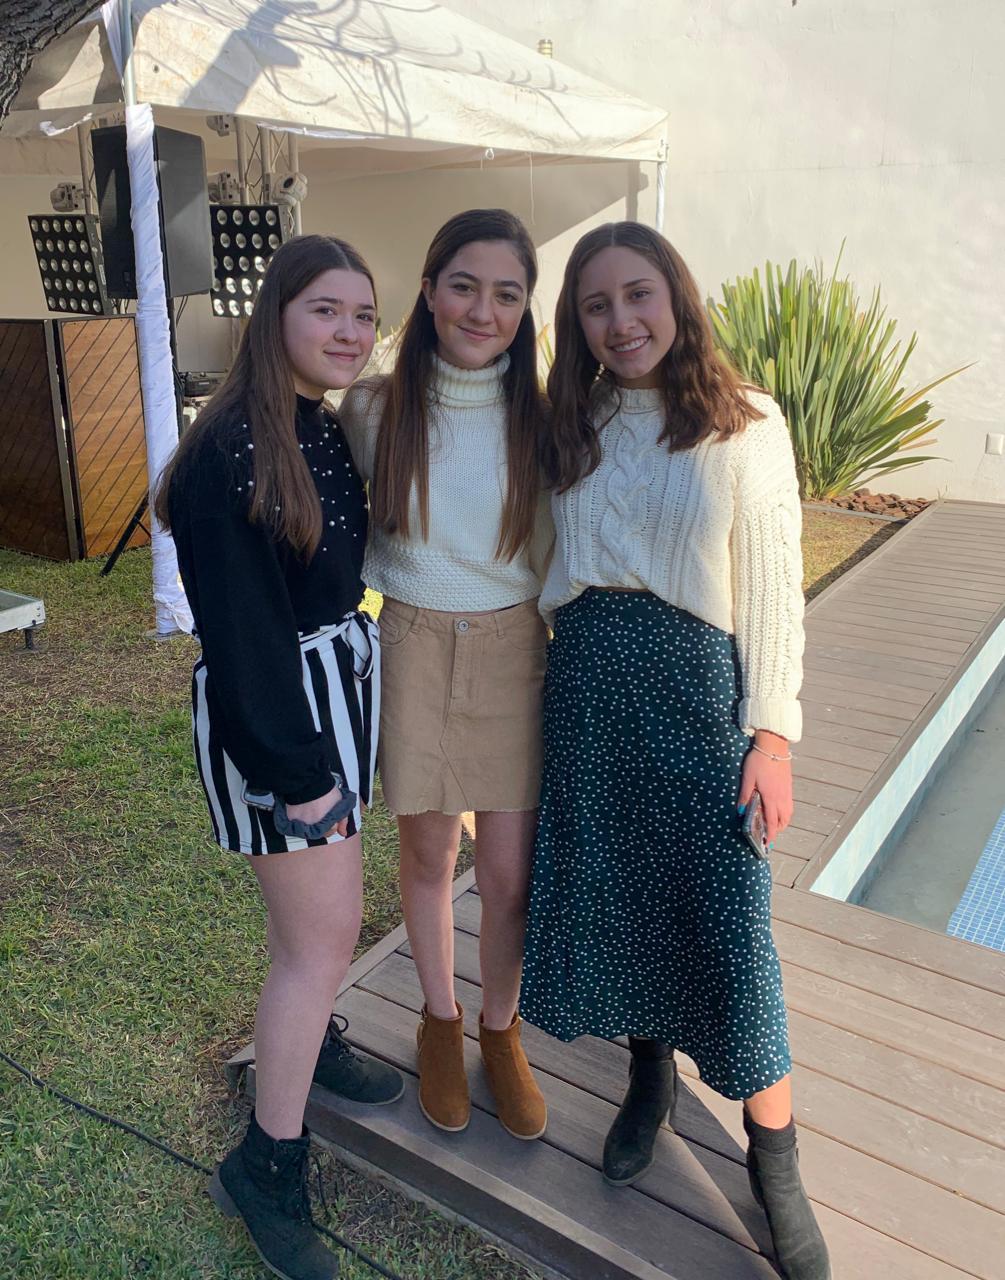 Isabelle Sierra, Daniela Sánchez y Mariángela Lozano.